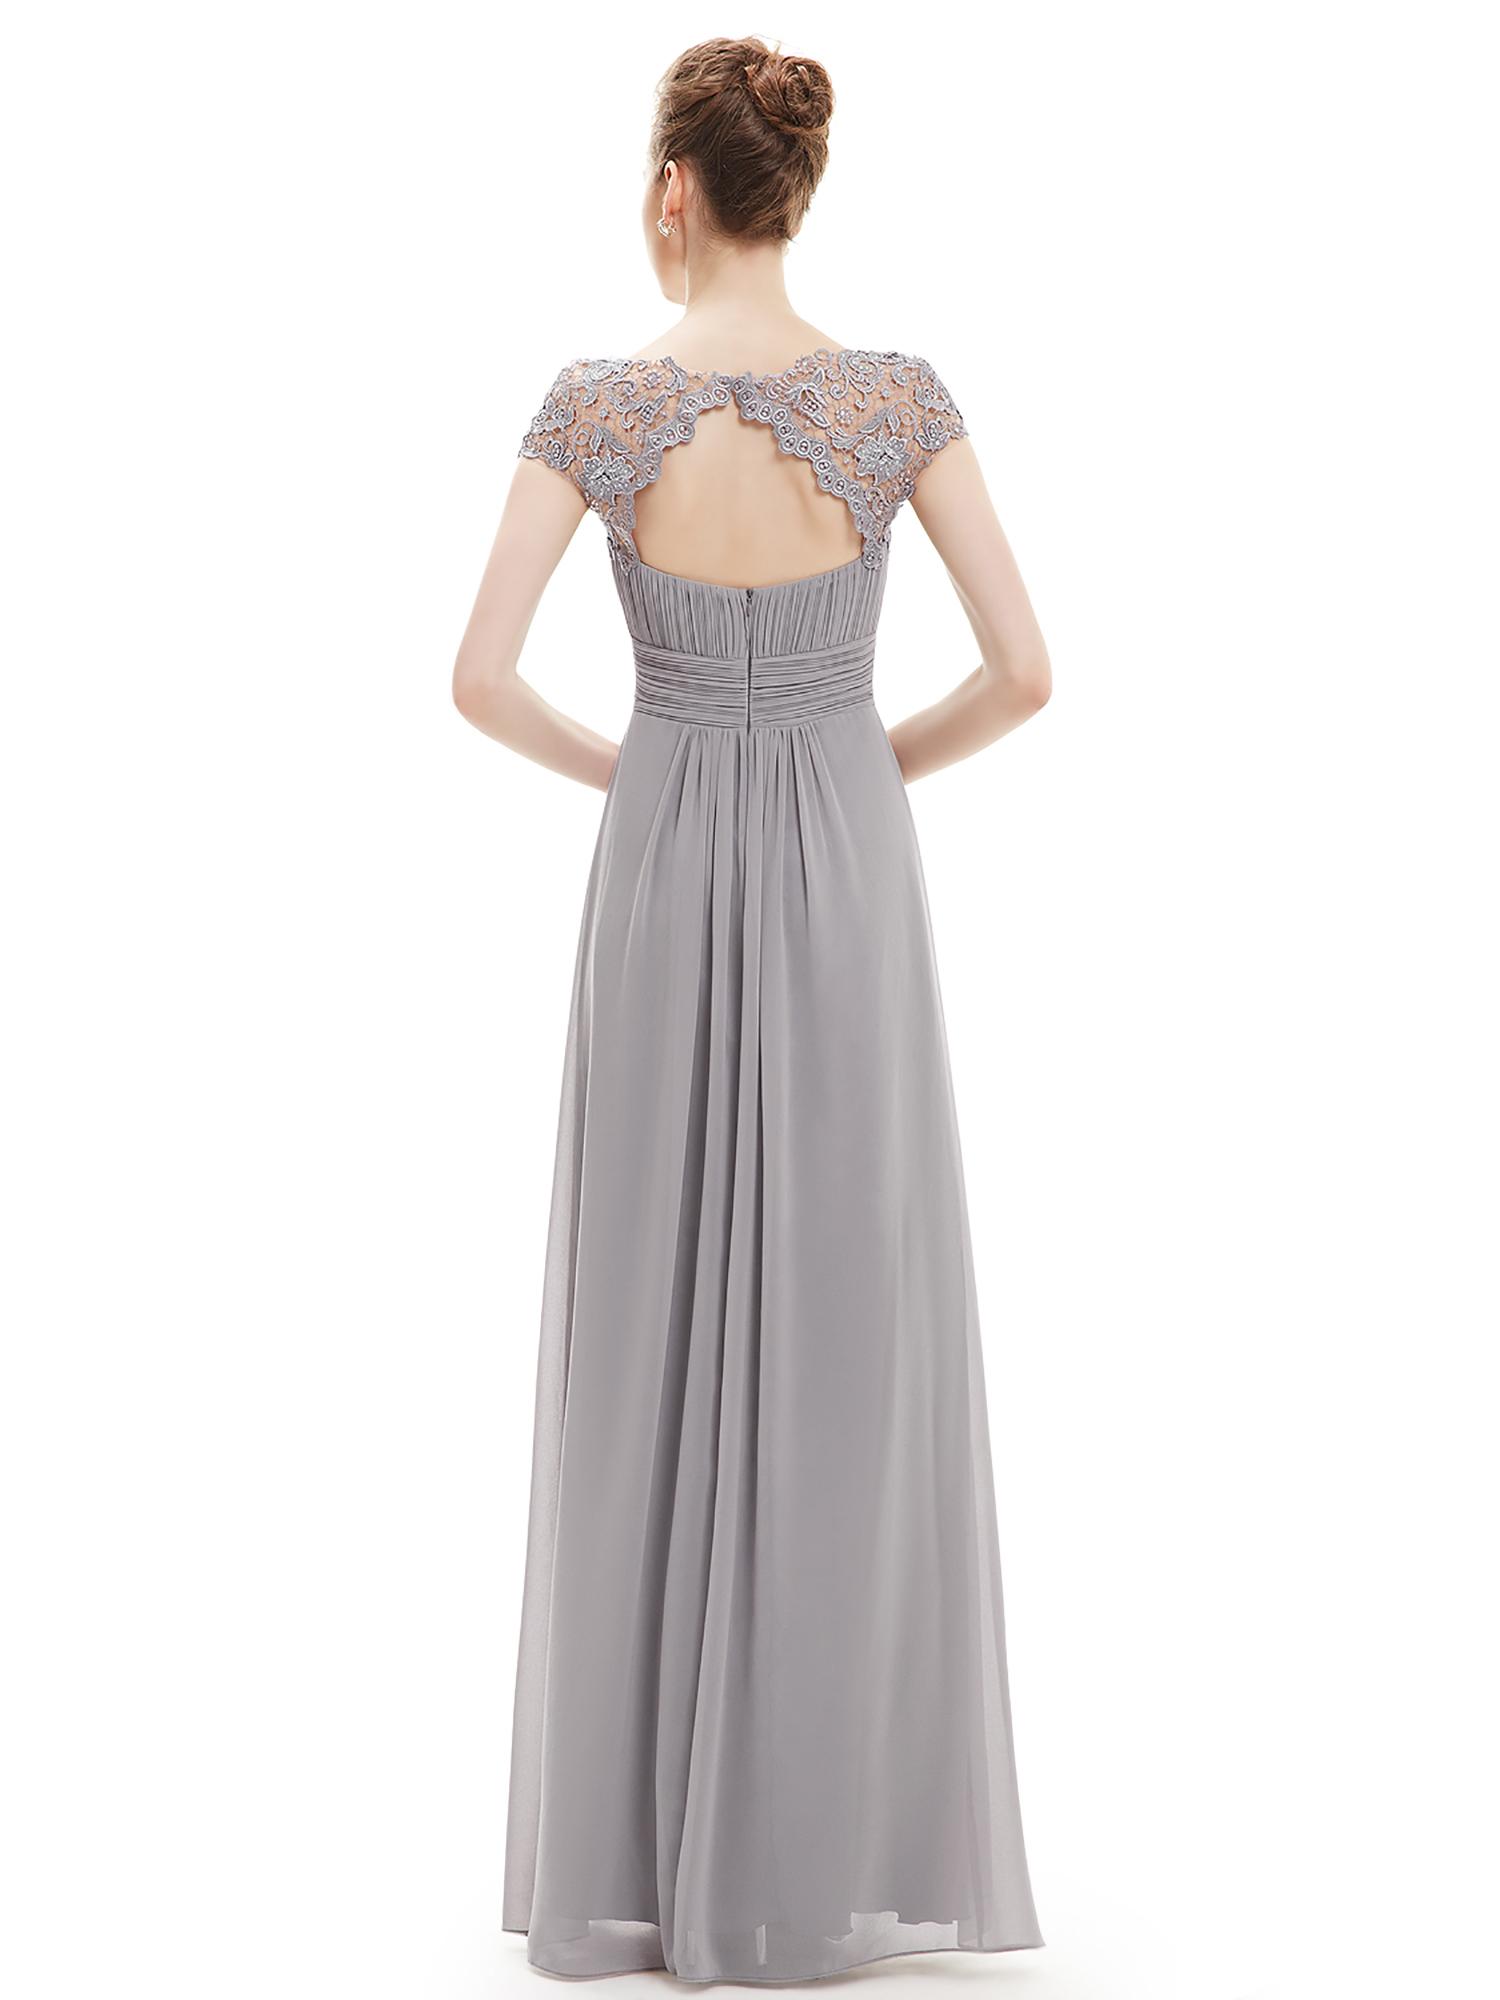 Uk new long maxi bridesmaid dresses evening dress lace bead prom uk new long maxi bridesmaid dresses evening dress ombrellifo Choice Image